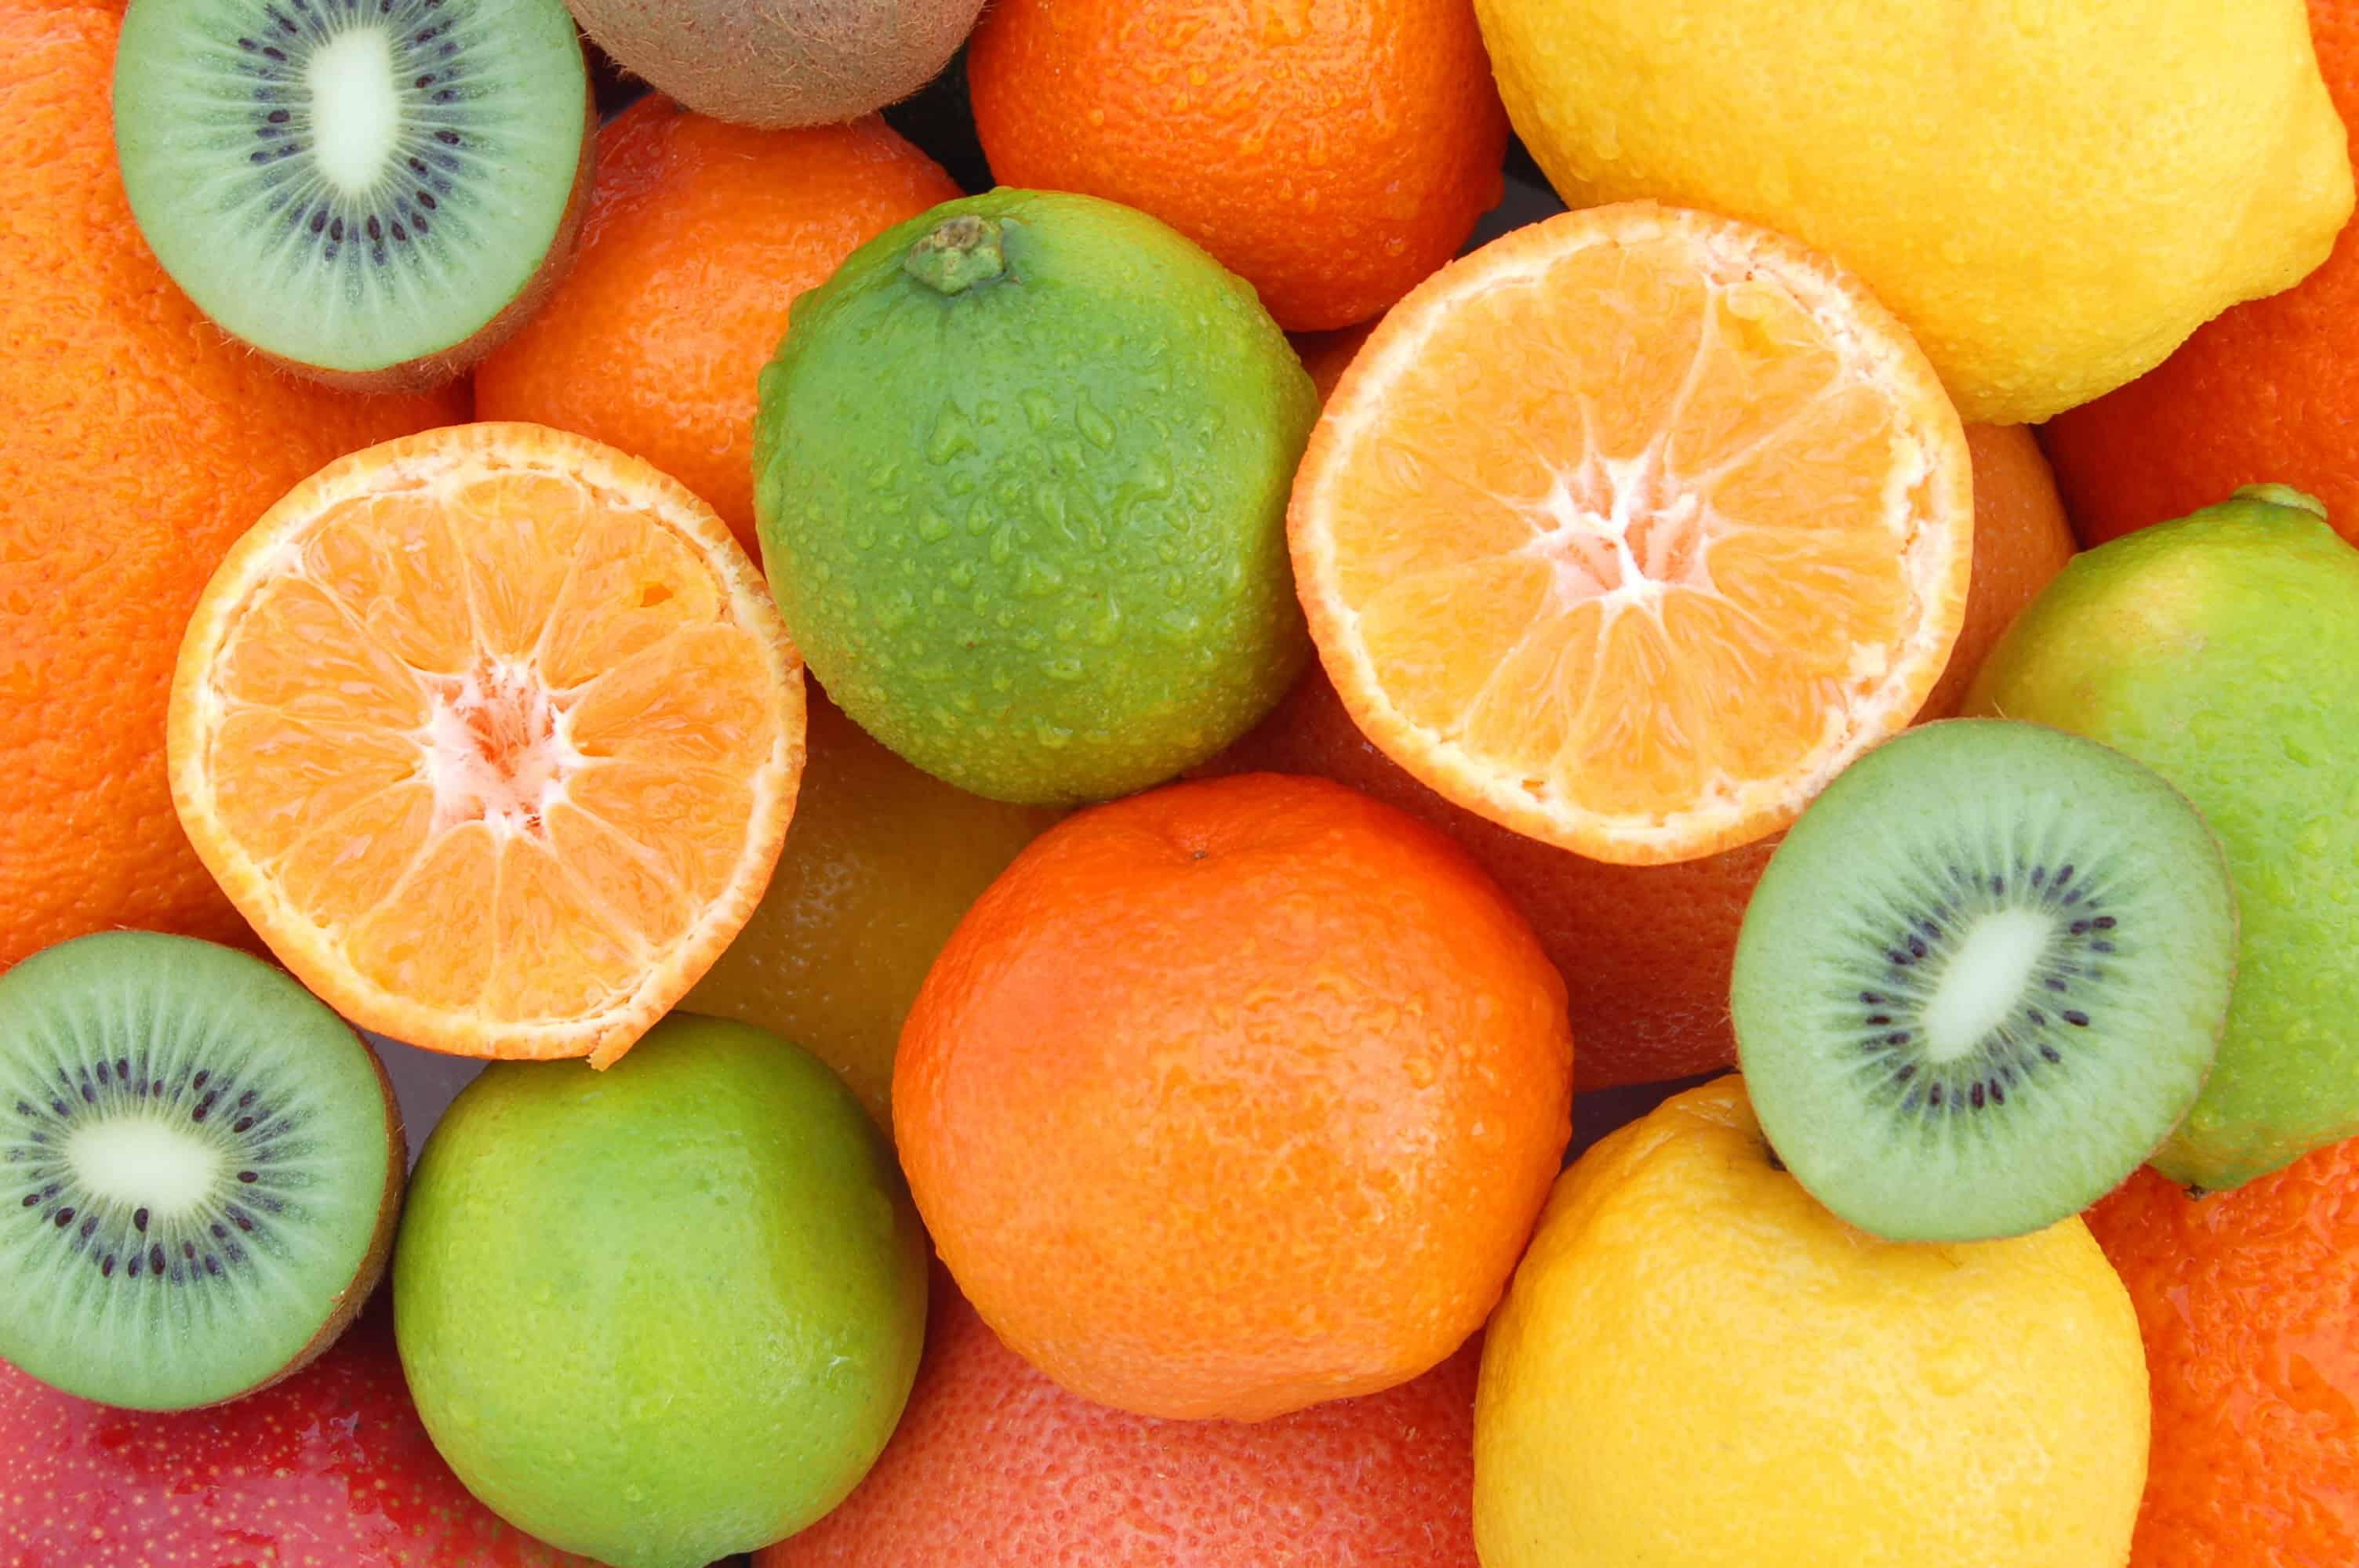 Proces a podpora tvorby kolagénu v tele stravou a jeho vplyv na pohybový aparát a pokožku